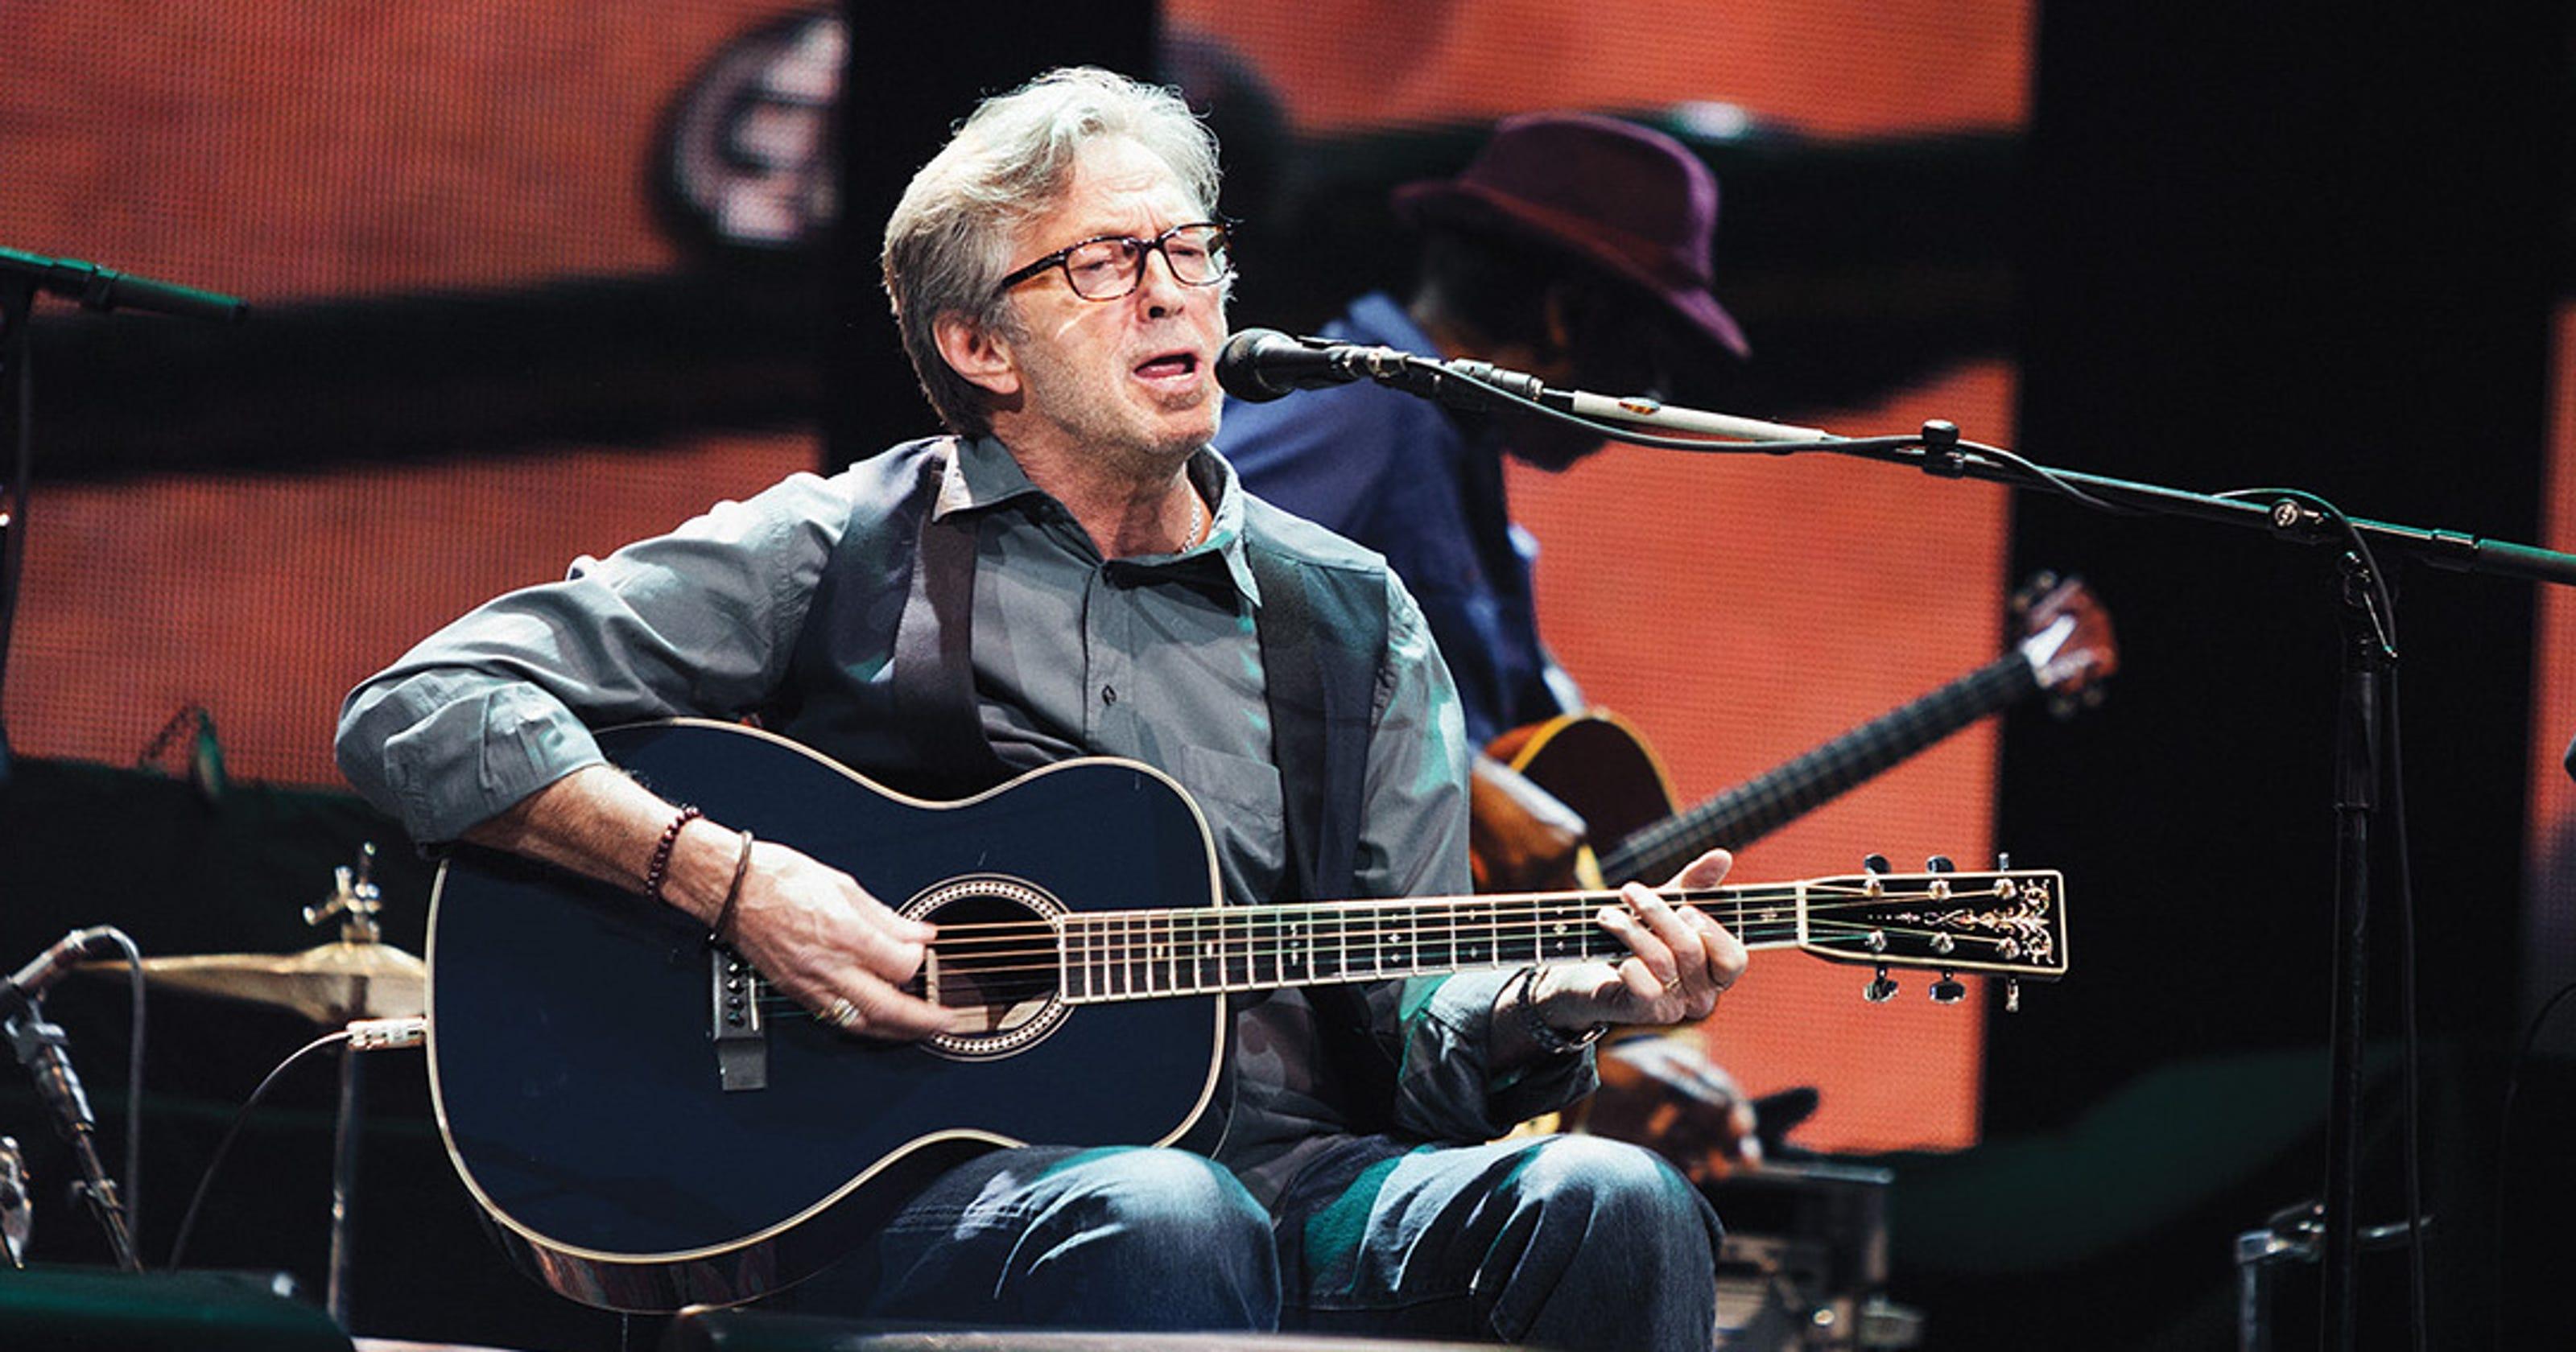 Video premiere: Eric Clapton's live 'Tears in Heaven'